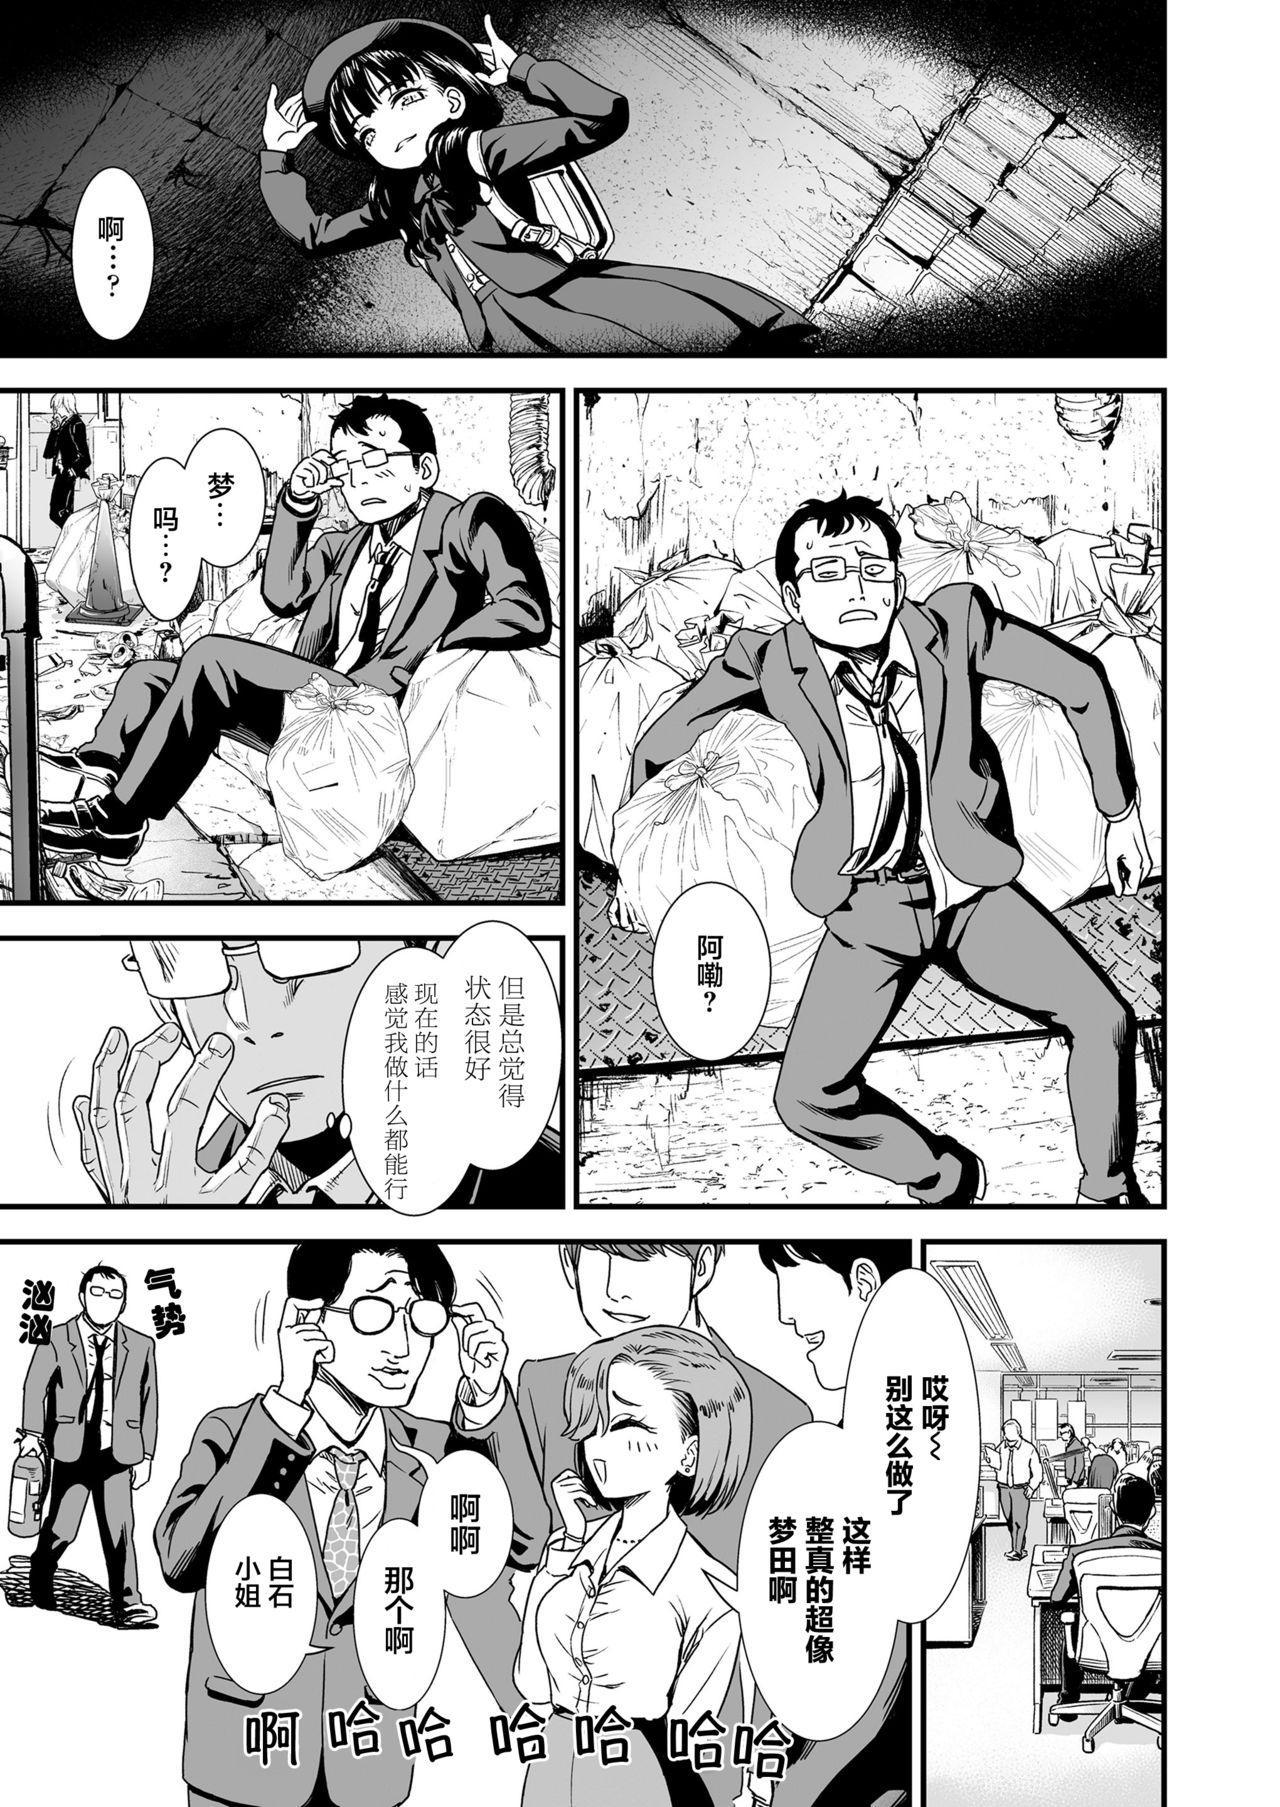 [Sabaku] Miss.Yoruko in midnight (Show your manliness to Yoruko)   「午夜时的夜子小姐「让夜子看看你男人的一面」」(COMIC LO 2021-06) [Chinese] [Digital] 27